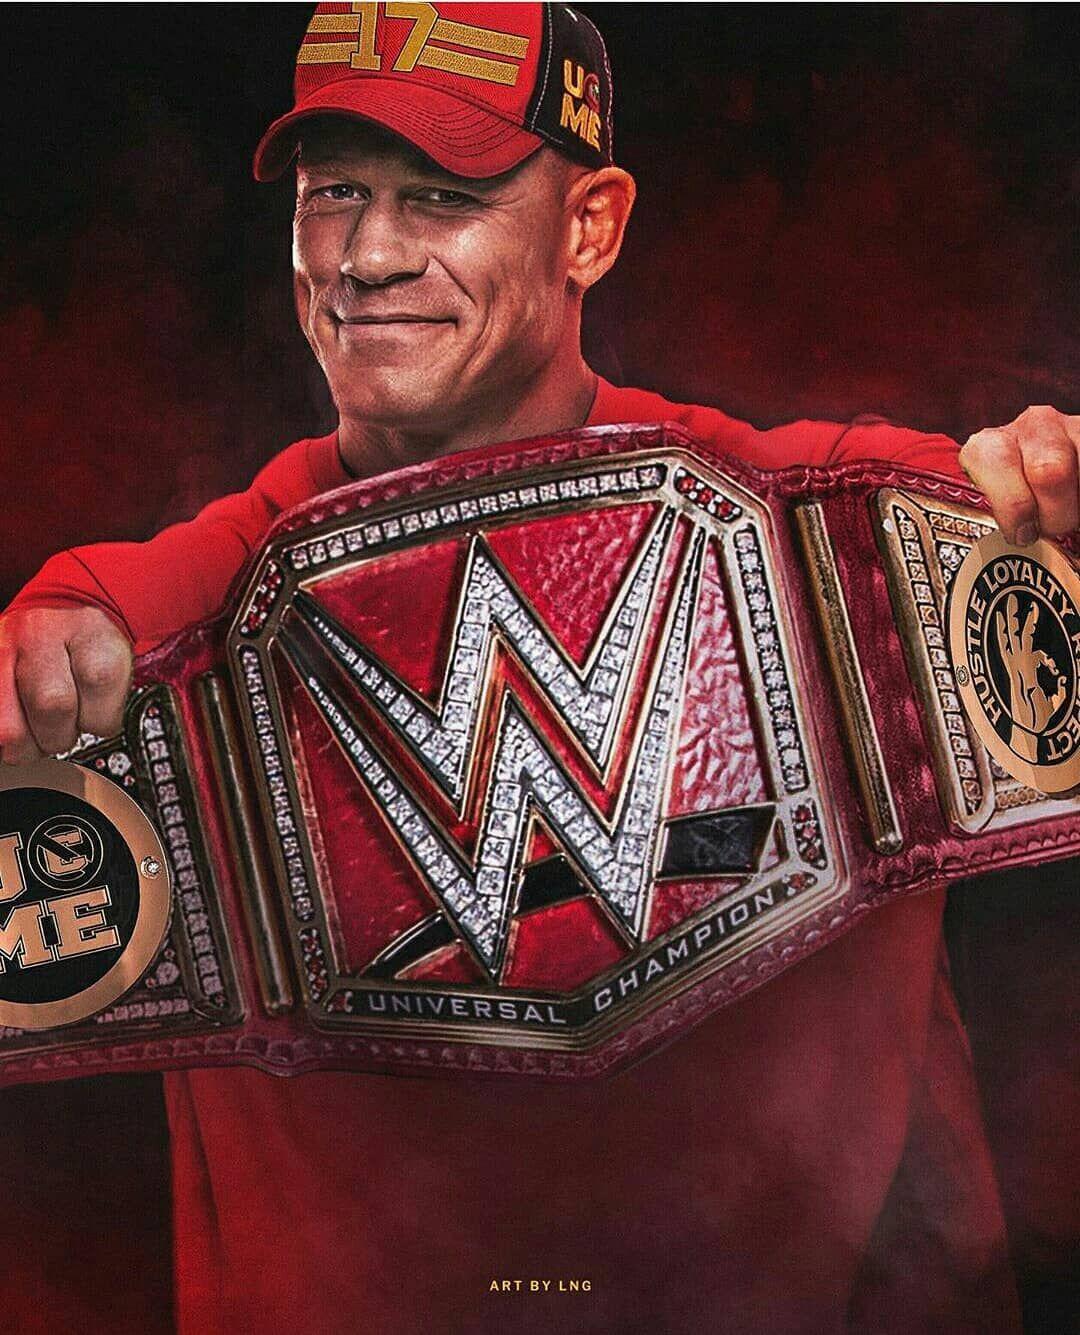 Wkj Jatin On Instagram Cena As 17x Wwe Champion I Have Made This Image My Lock Scree John Cena Wwe Champion Wwe Champions Wwe Superstar John Cena